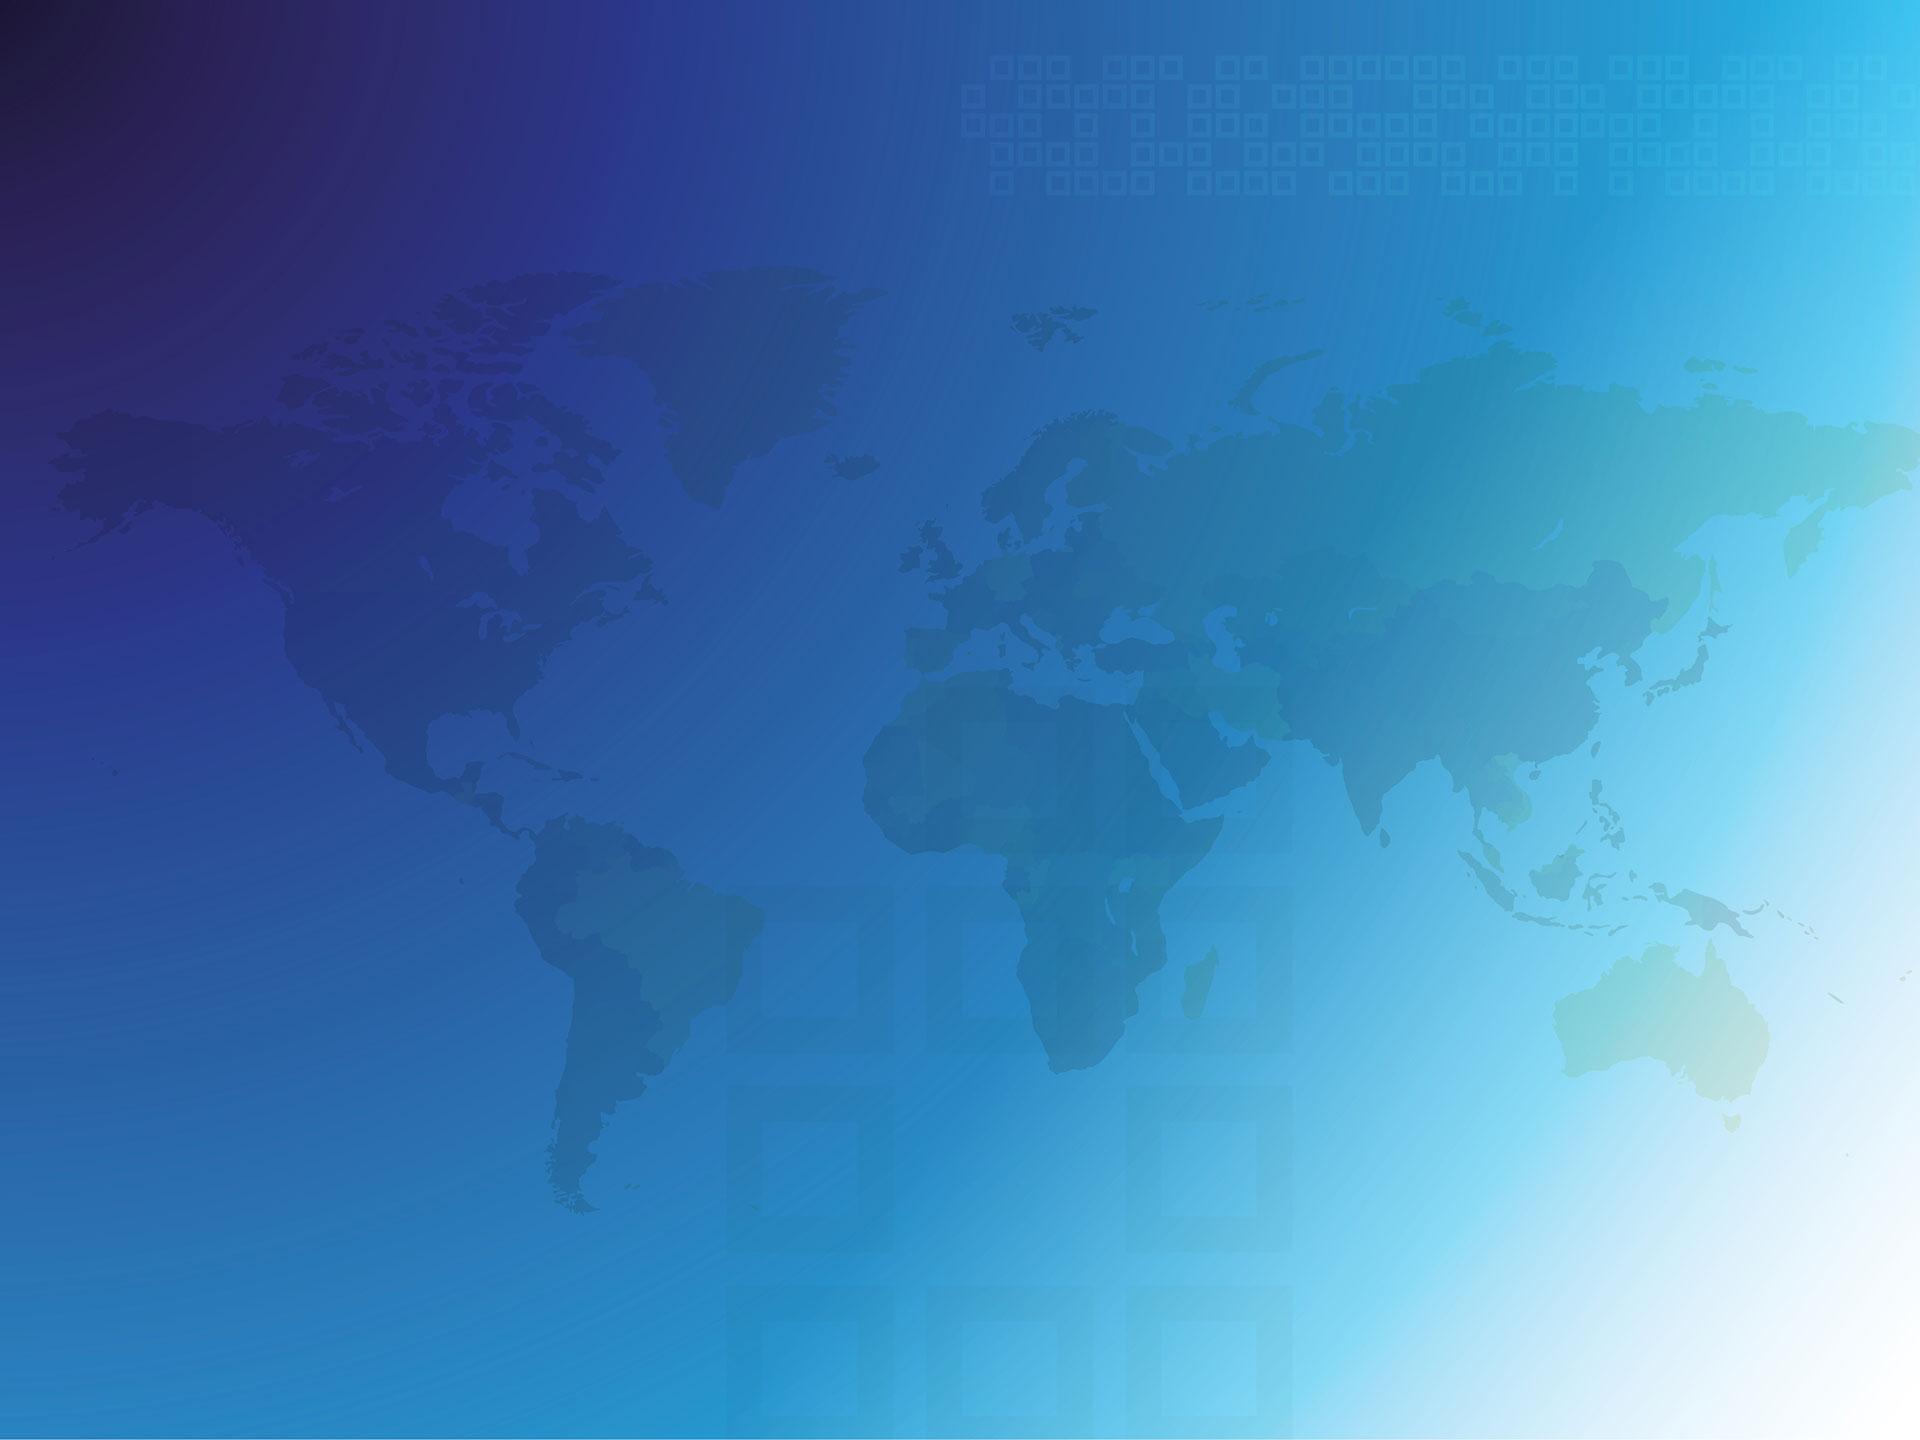 Regulator mediation services—Australia 2014